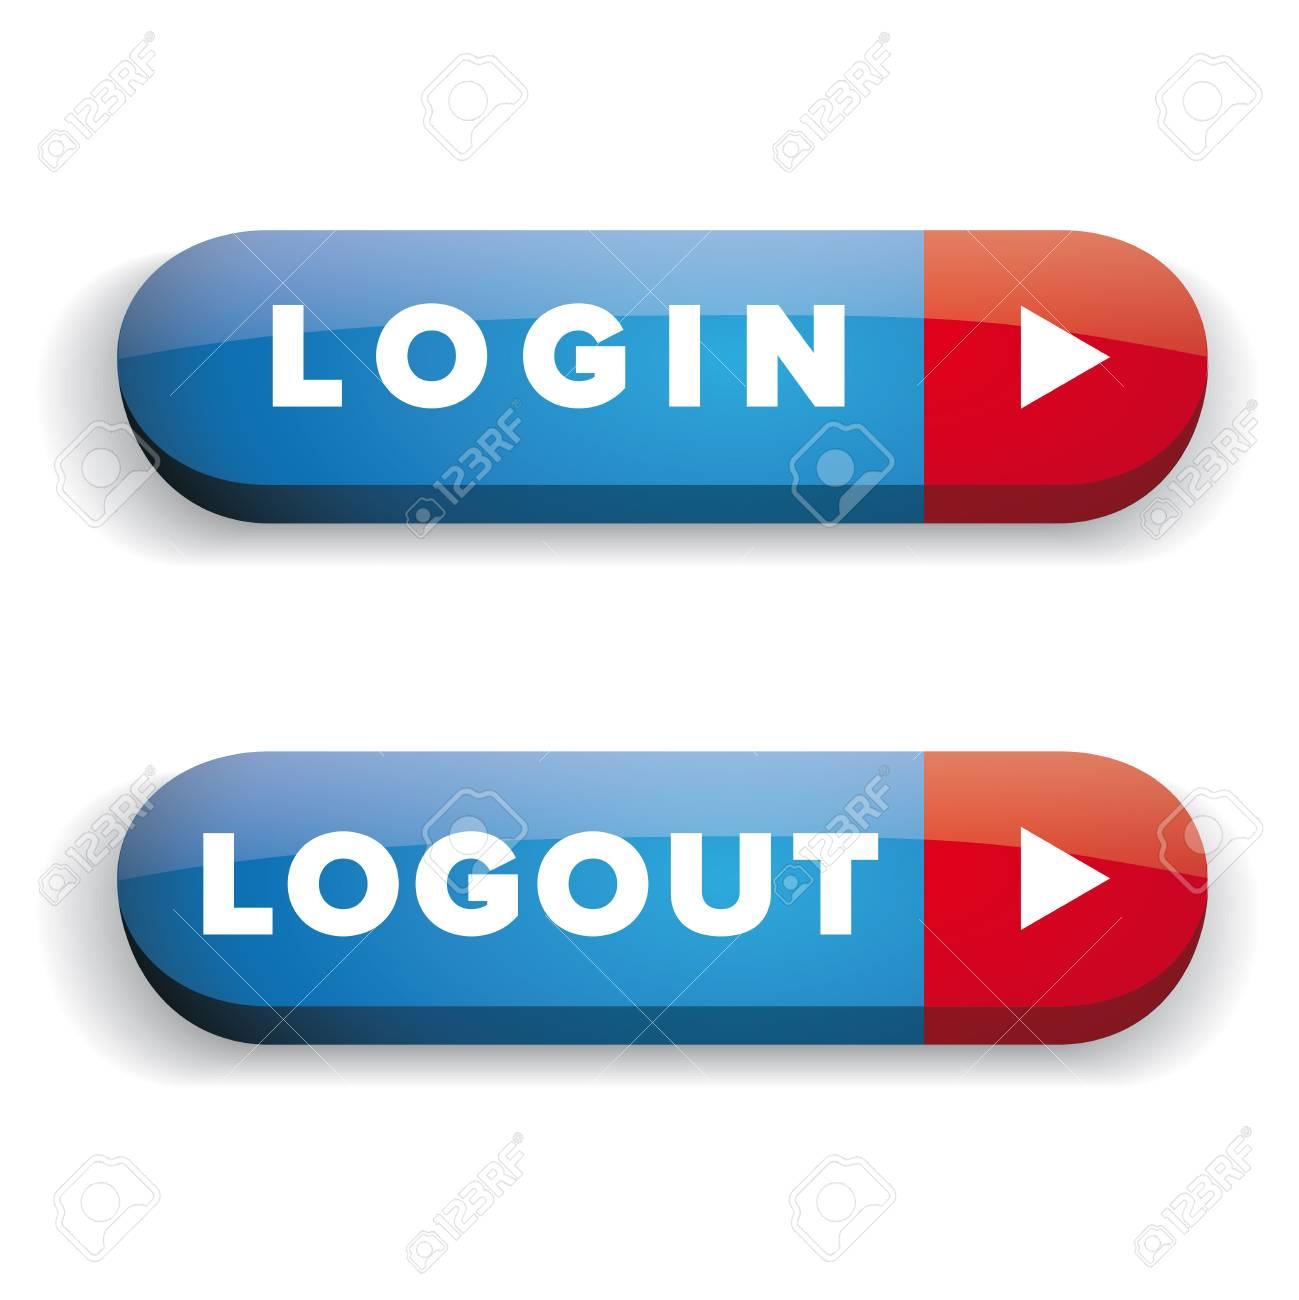 Login Logout Button Vector Set Royalty Free Cliparts, Vectors, And ...